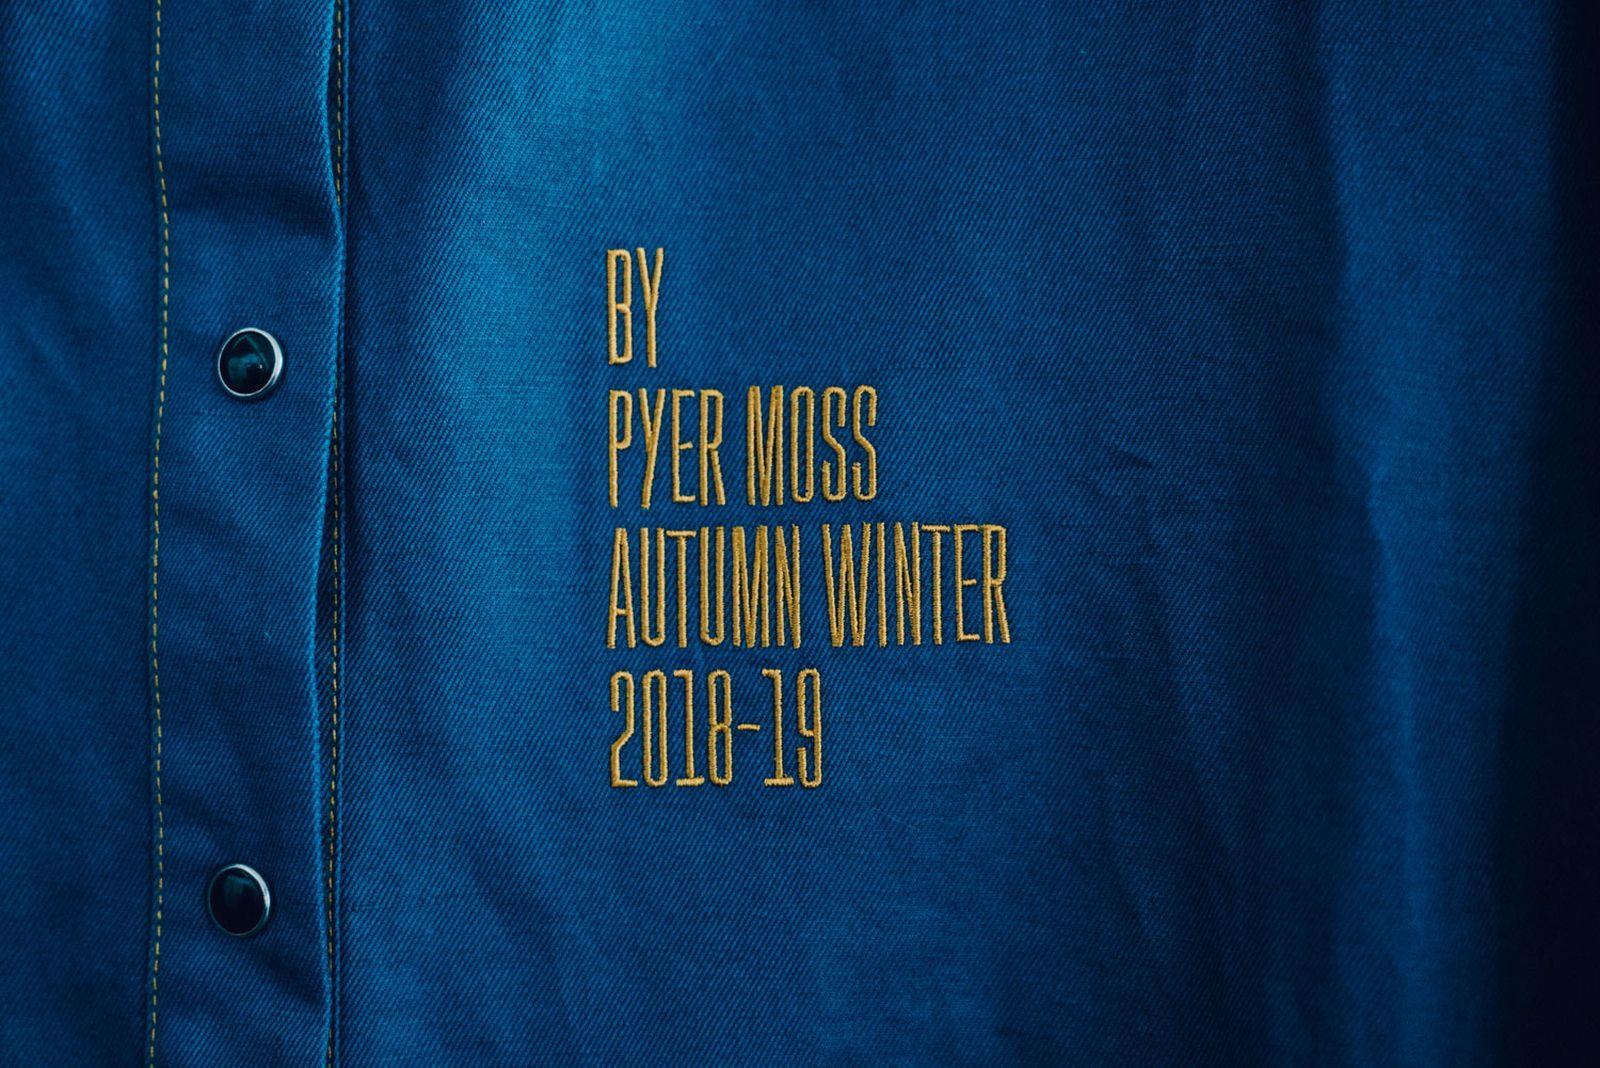 pyer moss sneakers highsnobiety bryan luna Fw18 fall winter 2018 new york fashion week